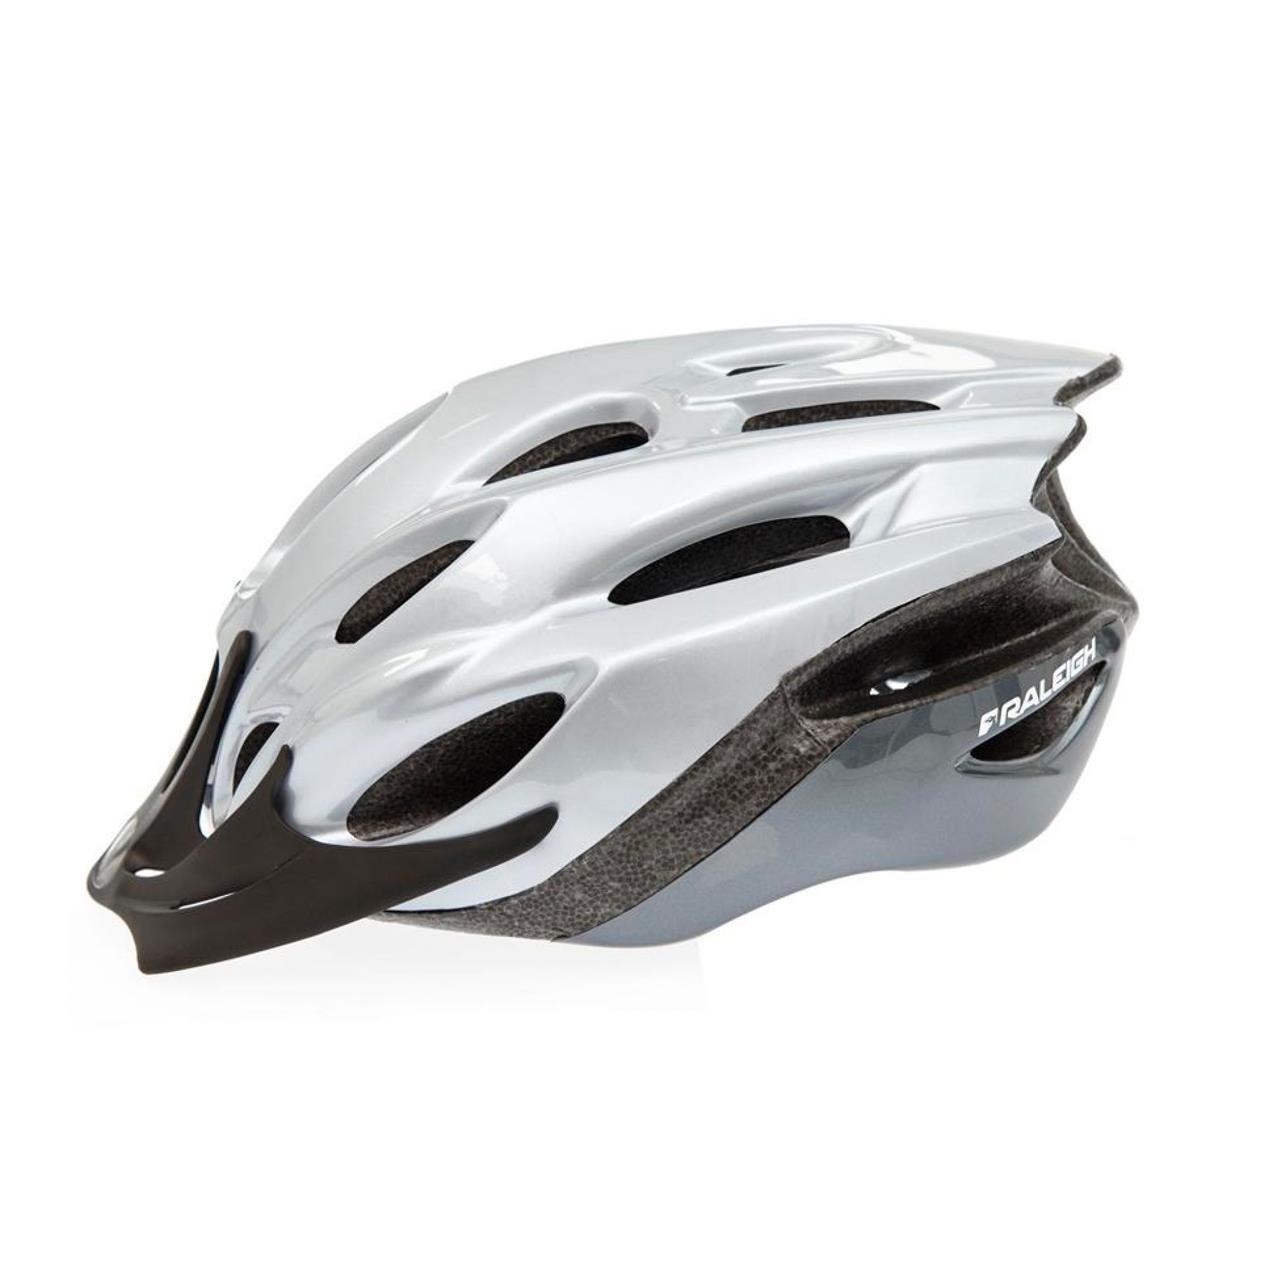 Raleigh Mission Evo Helmet - Silver